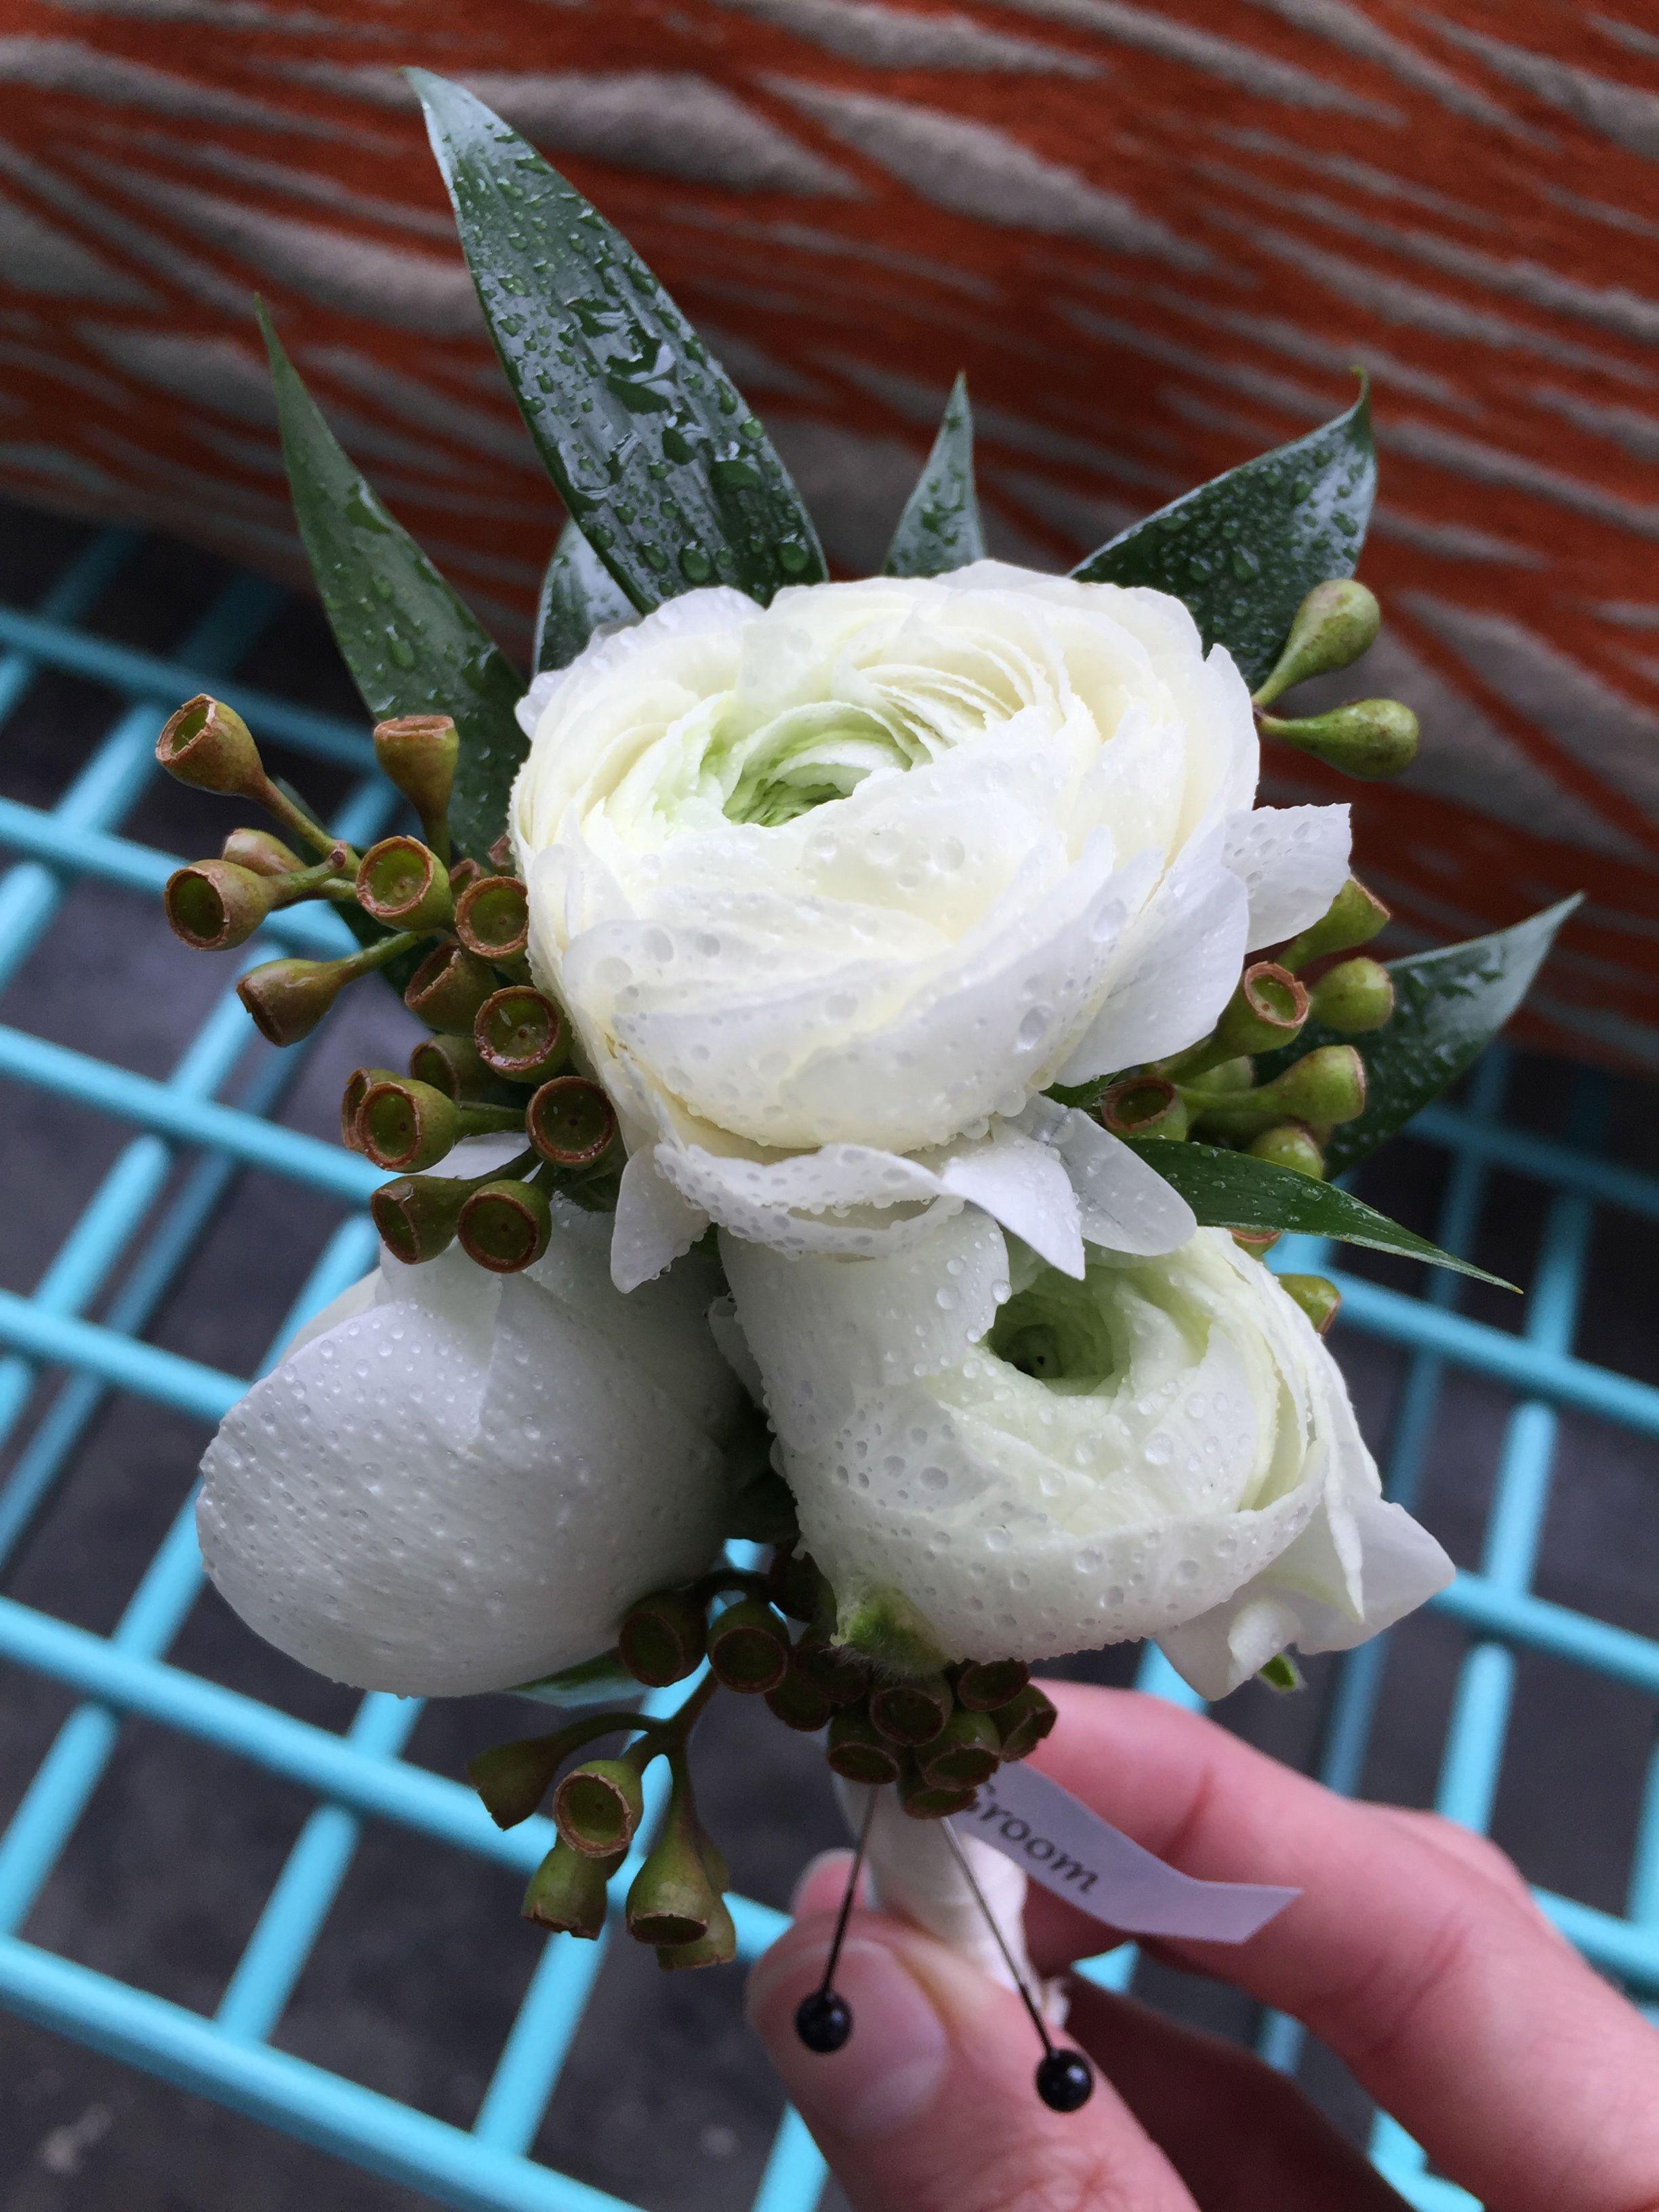 Corsage Wedding Artificial Flowers Hair Accessory Flower Crown Silk Flowers Millinery Artificial ORANGE WAXFLOWER Clusters- 35 Pieces